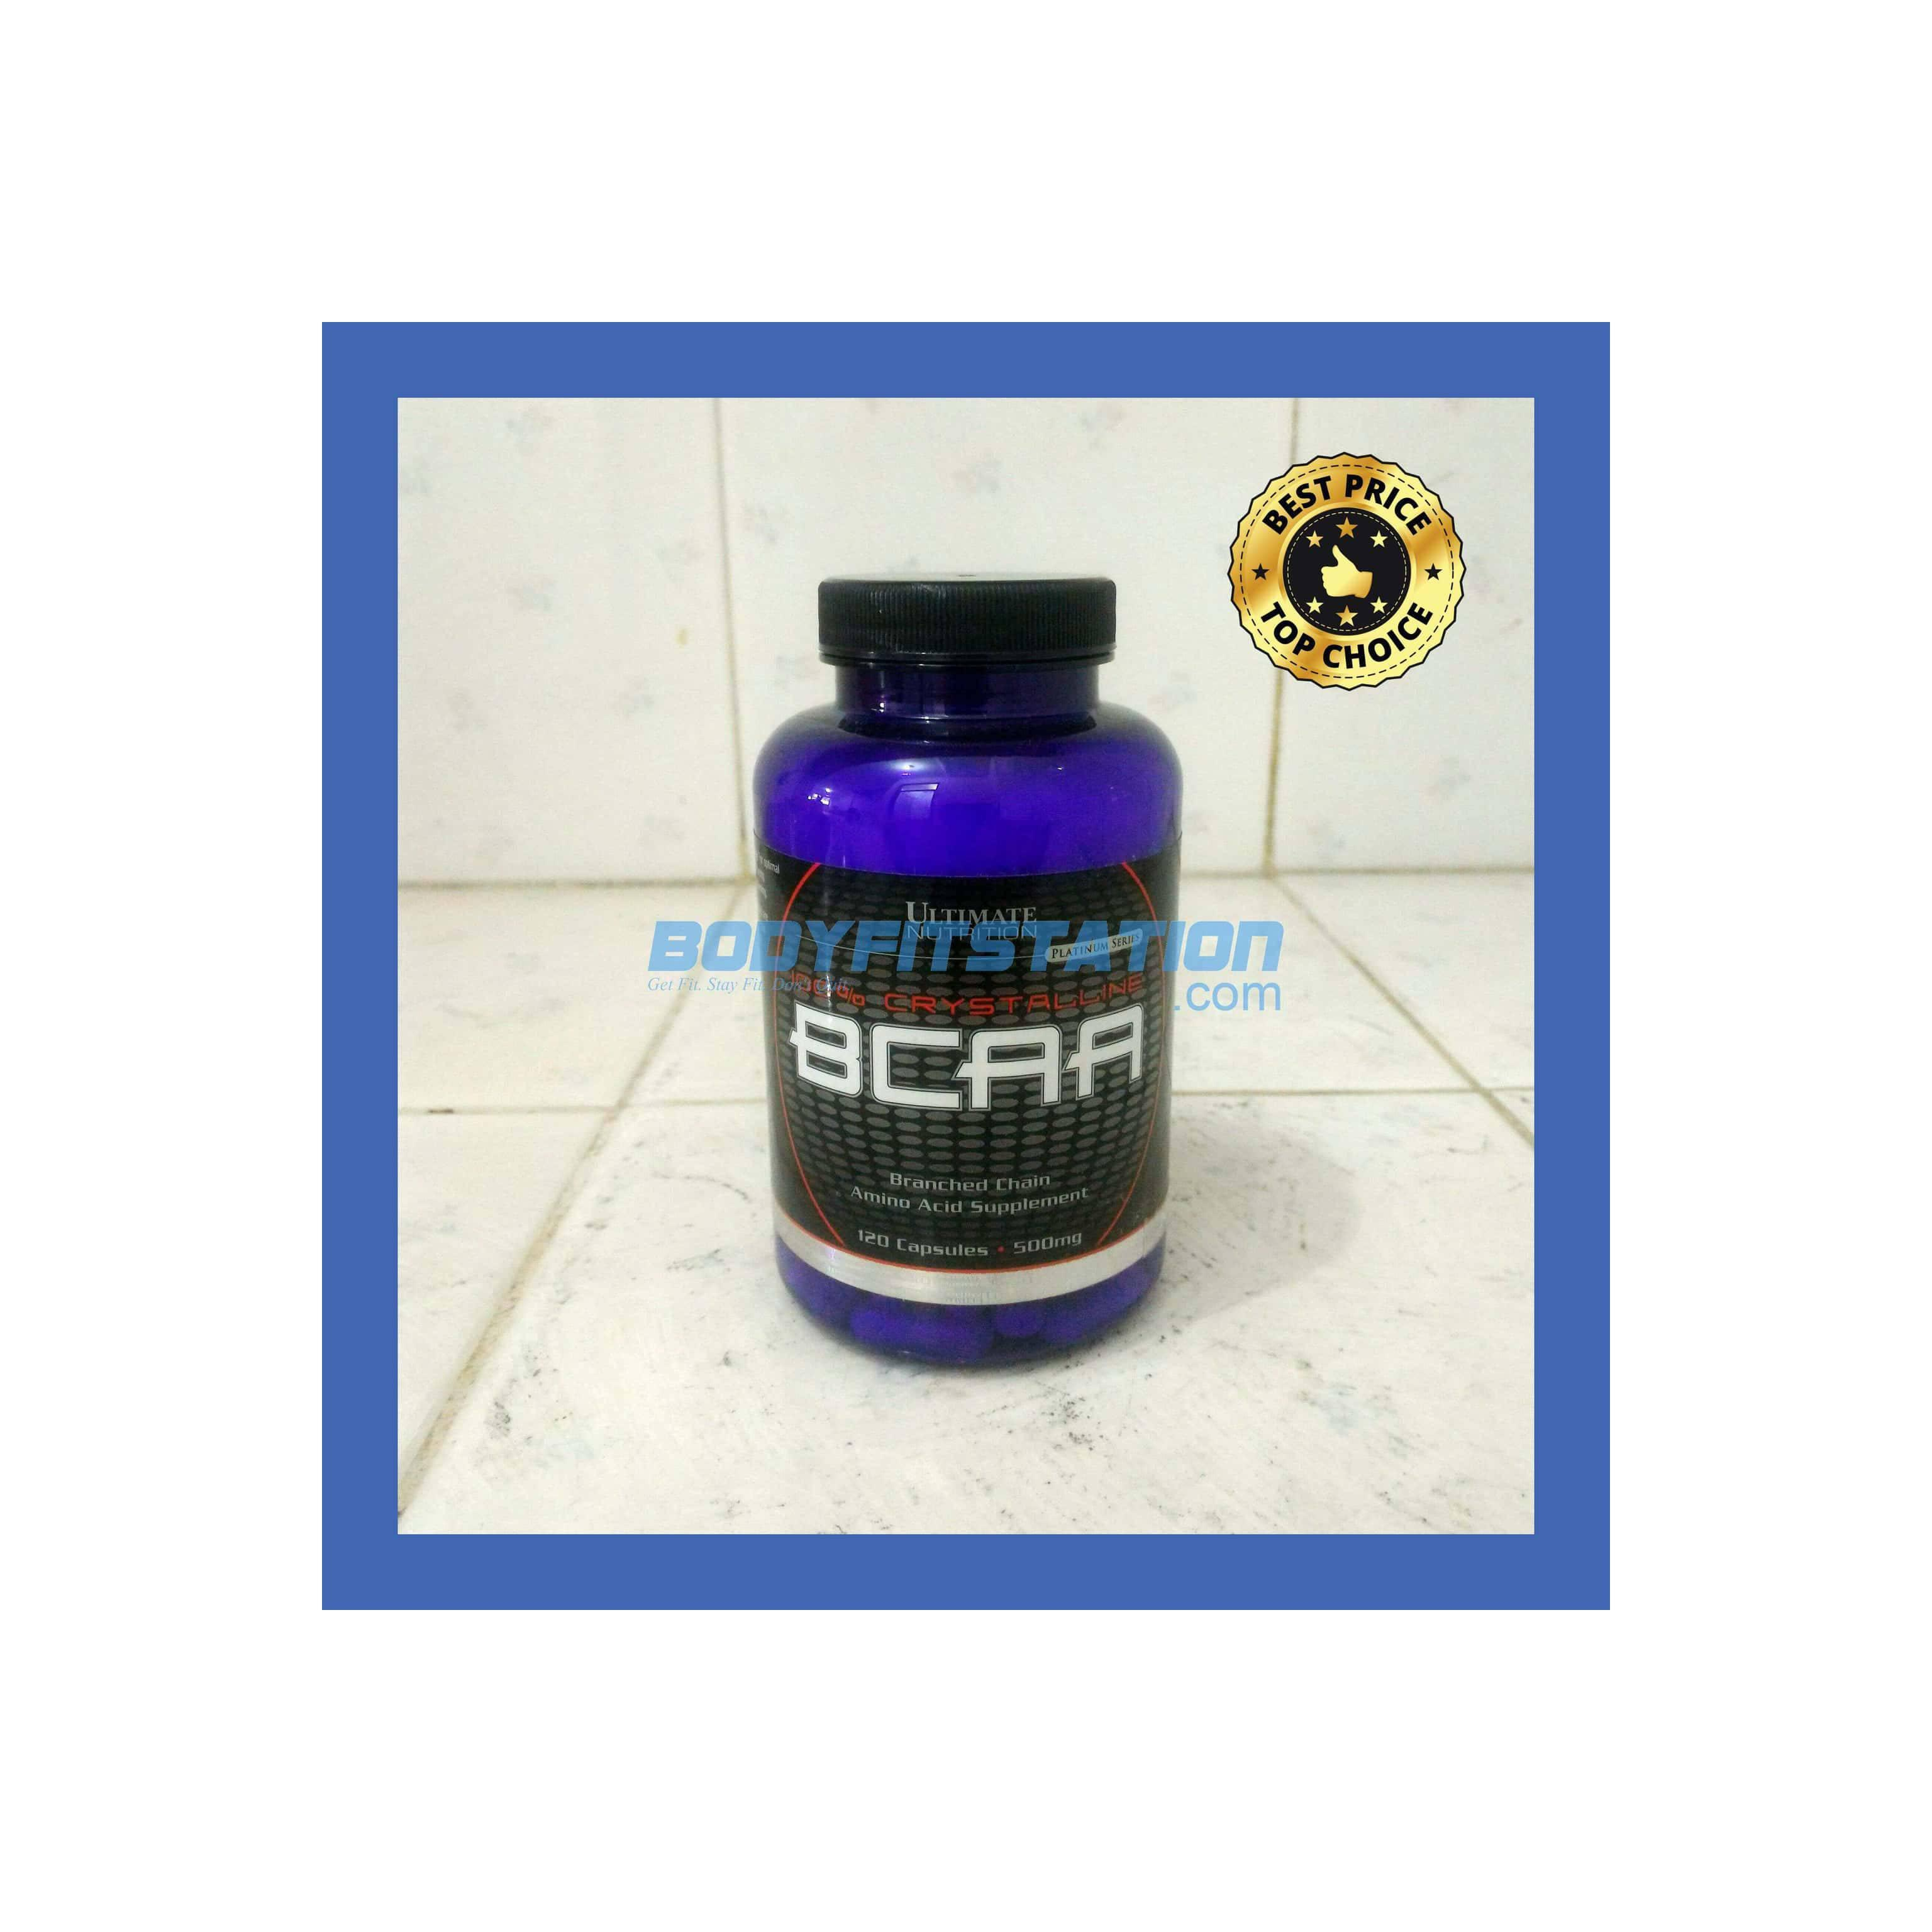 Harga Mhp Bcaa 3300 Isi 120 Kapsul Terbaru November 2018 Situs Ultimate Nutrition 500mg Caps 500 Mg Capsules Amino Un